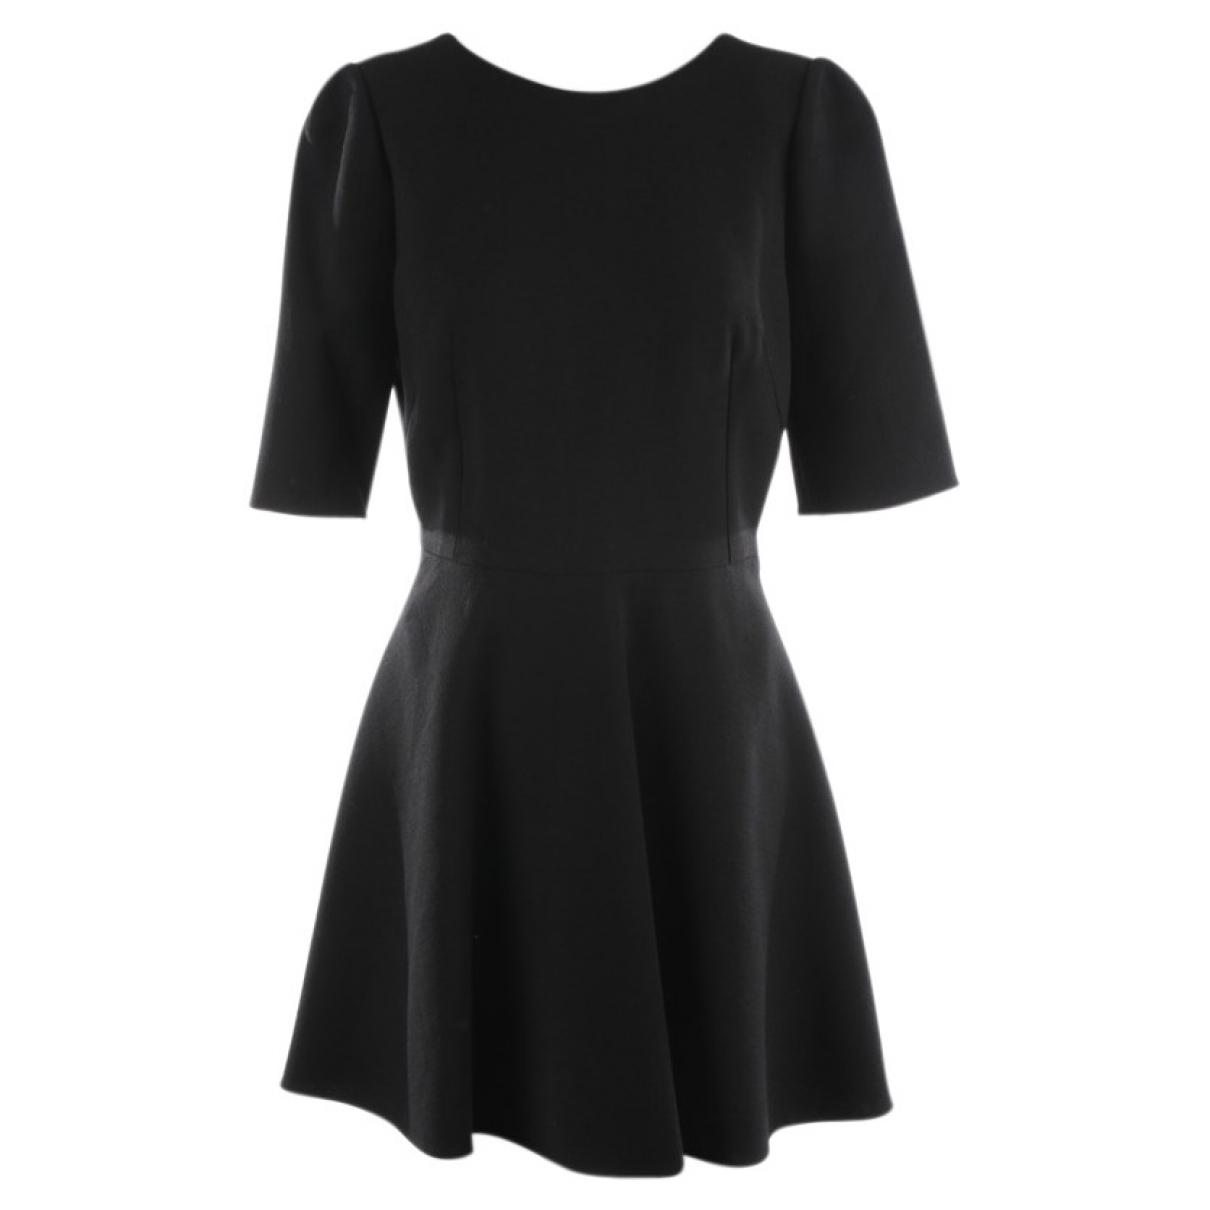 Dolce & Gabbana \N Black Wool dress for Women 36 FR